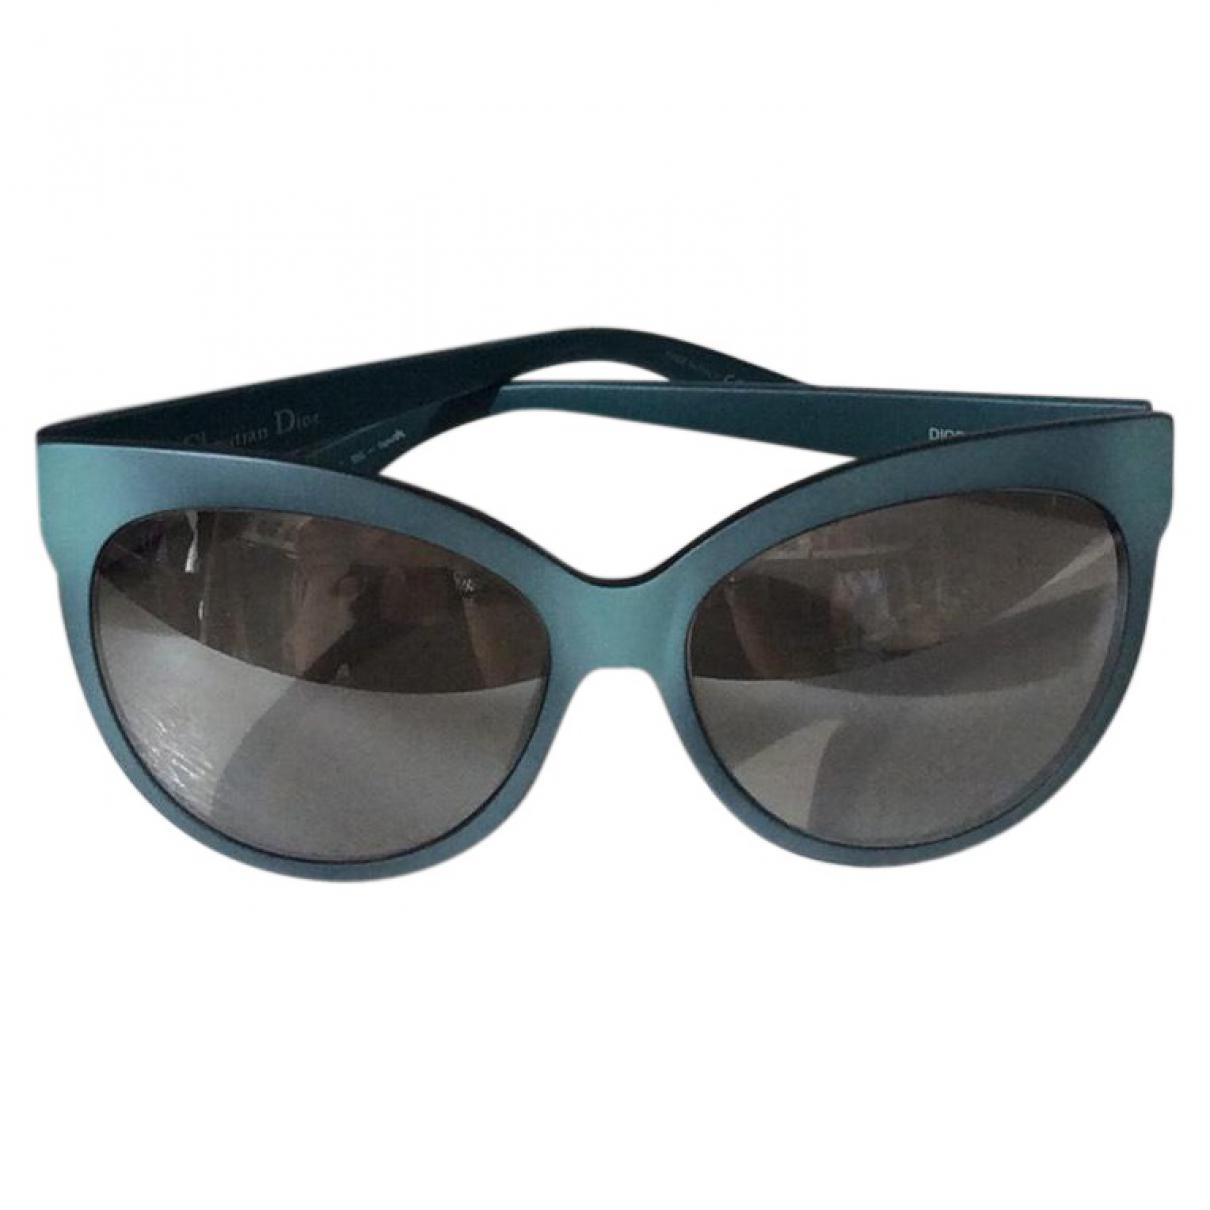 a64a29a9f412 Dior 100% Authentic Christian Sunglasses Blue   Mirror Lens in Blue ...